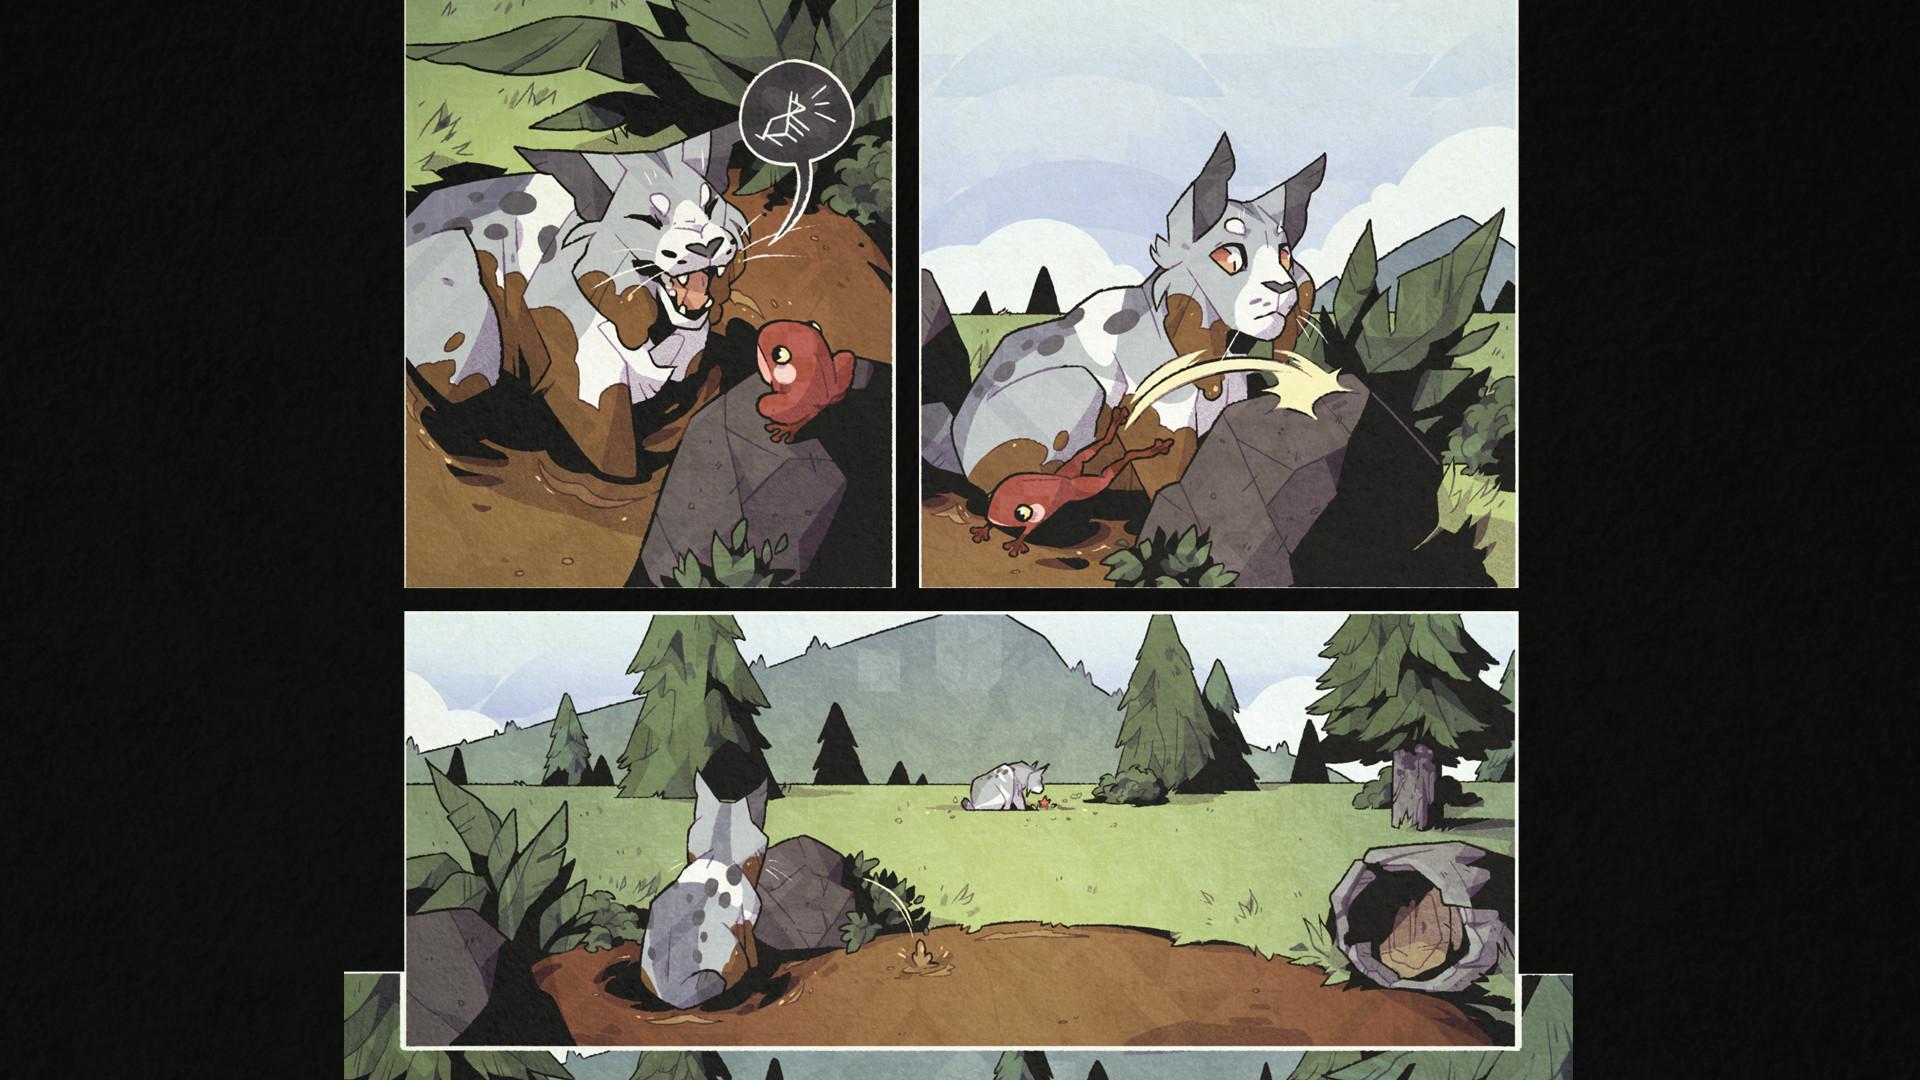 Blossom: a meadow comic book downloads